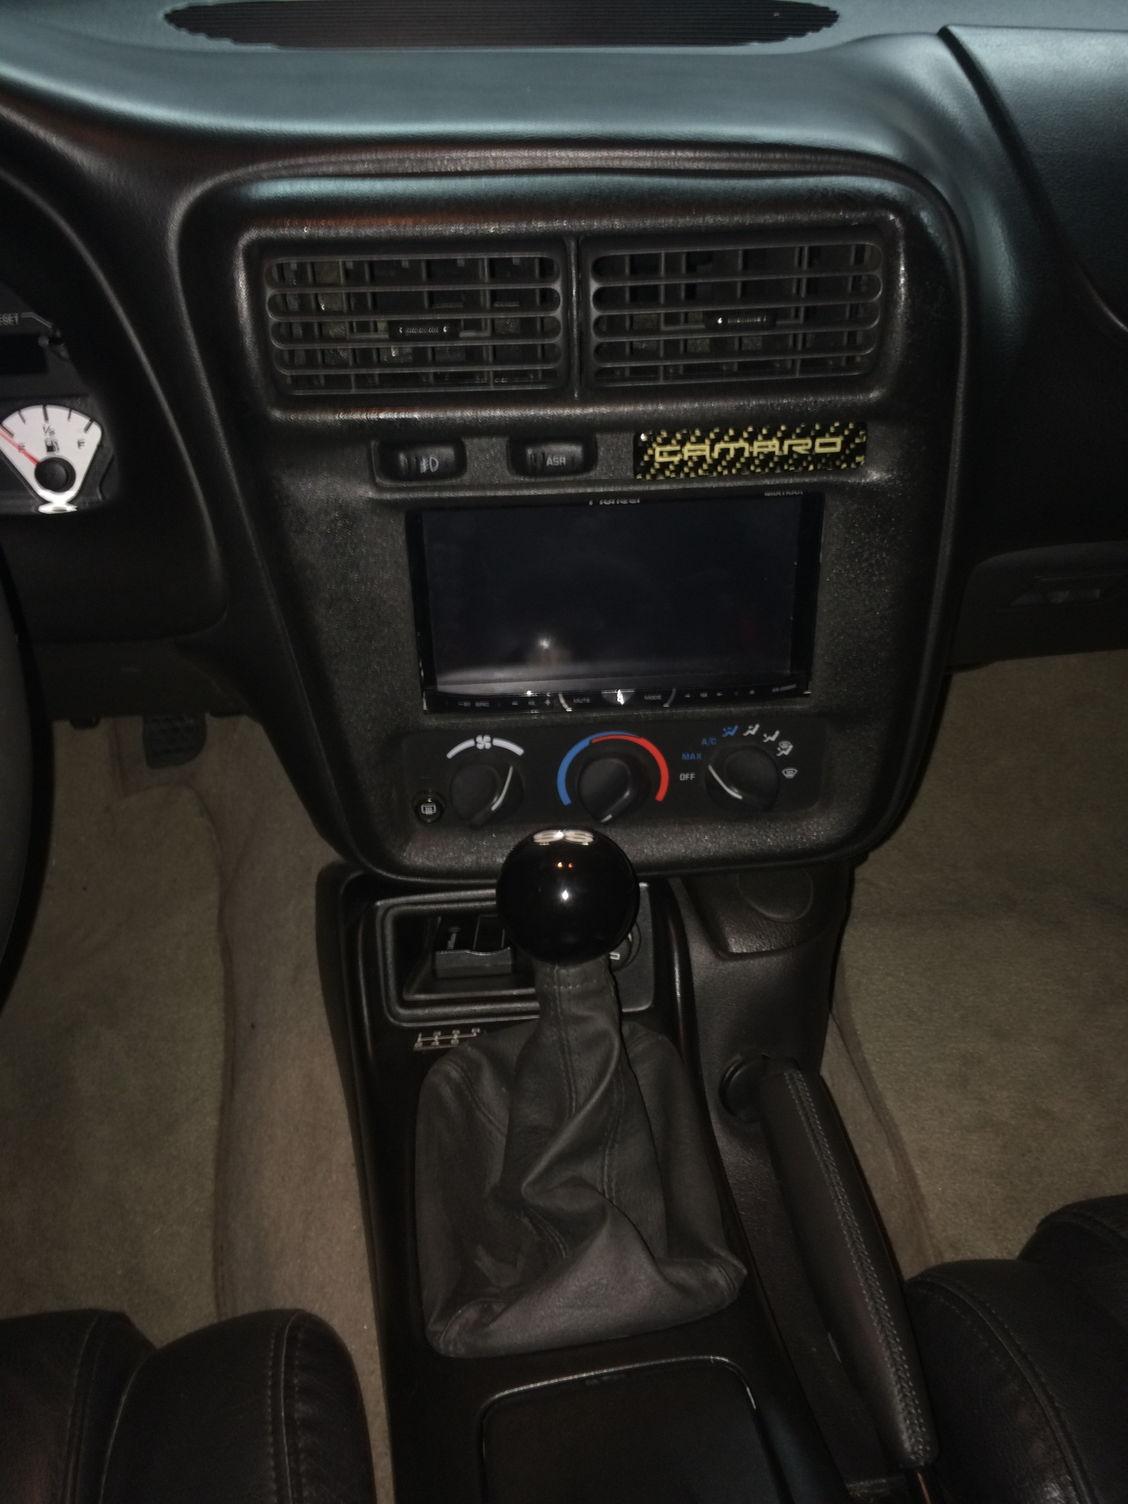 Maxresdefault in addition Chevrolet Camaro Z moreover Camaro Z also D Rare Camaro Z besides Camaro Lt X. on 2015 camaro z28